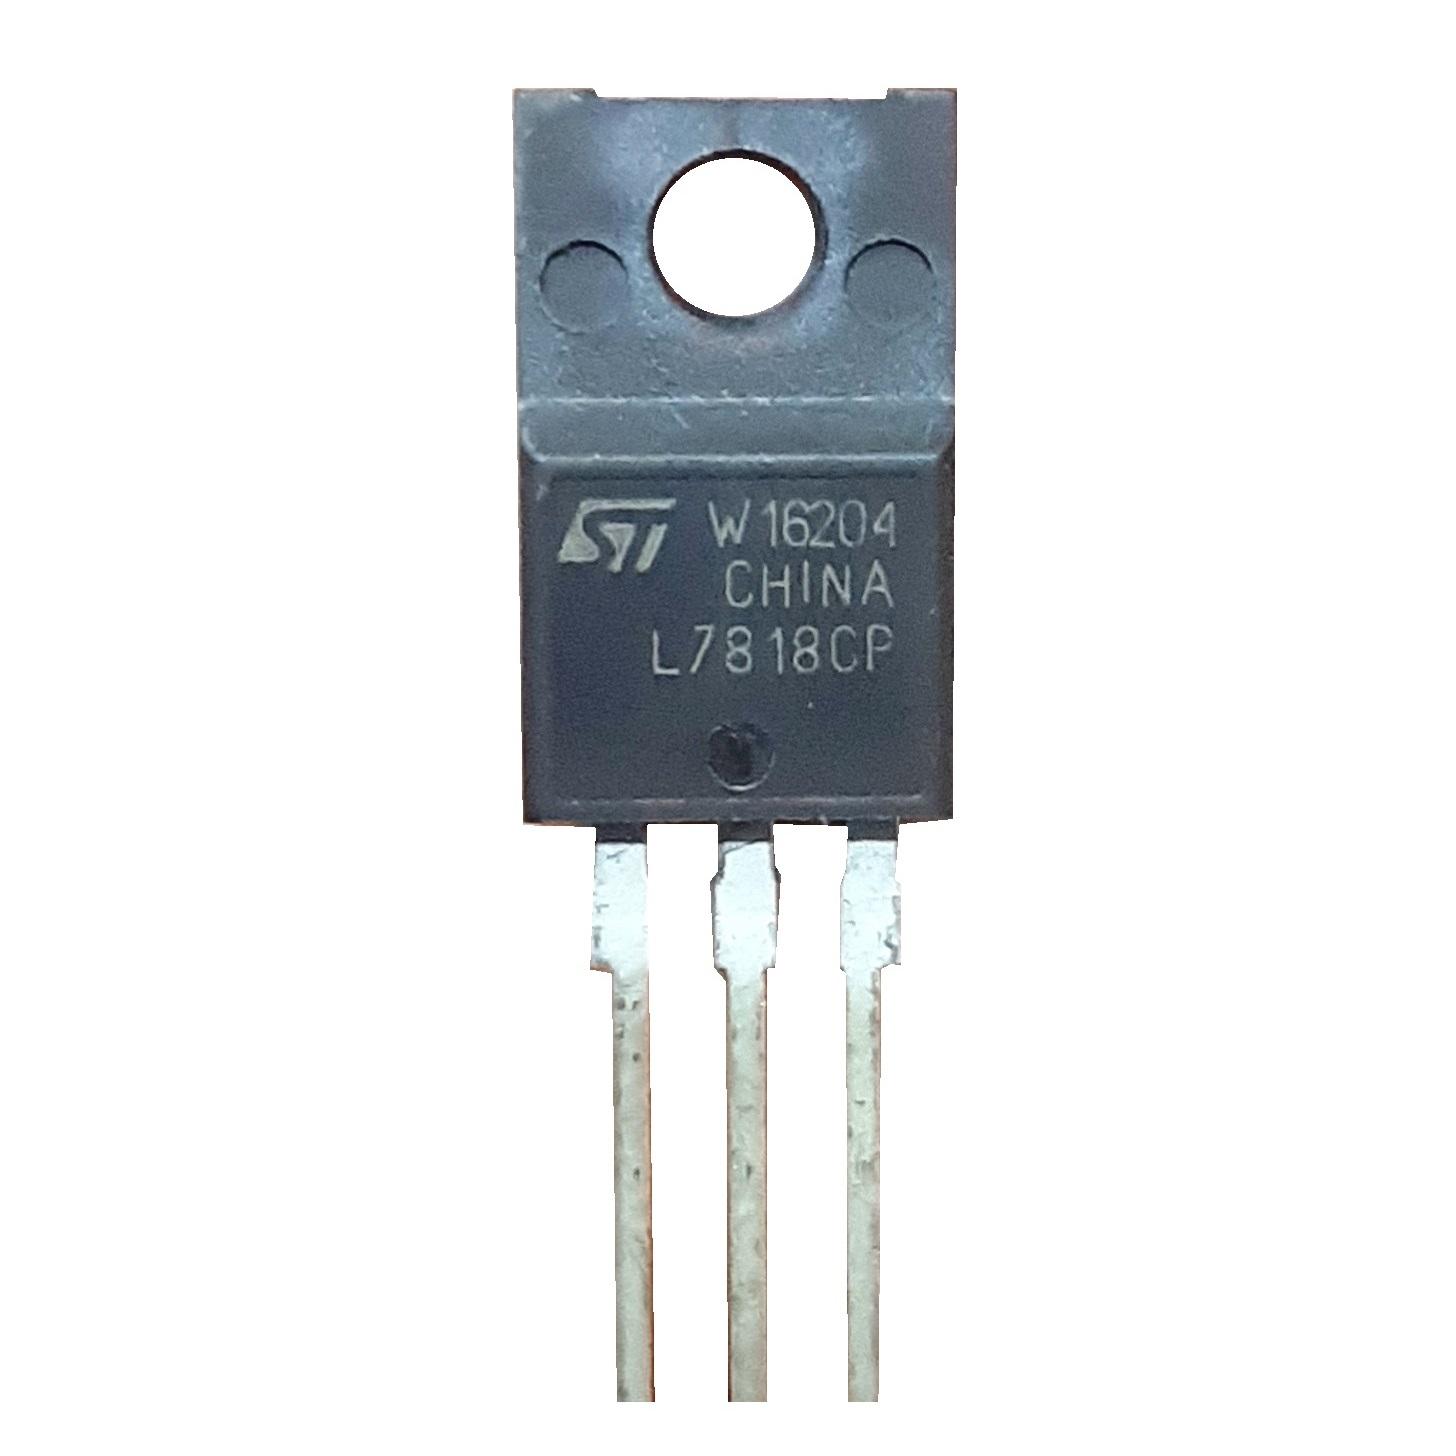 رگولاتور ولتاژ اس تی مایکروالکترونیکس مدل L7818 CP